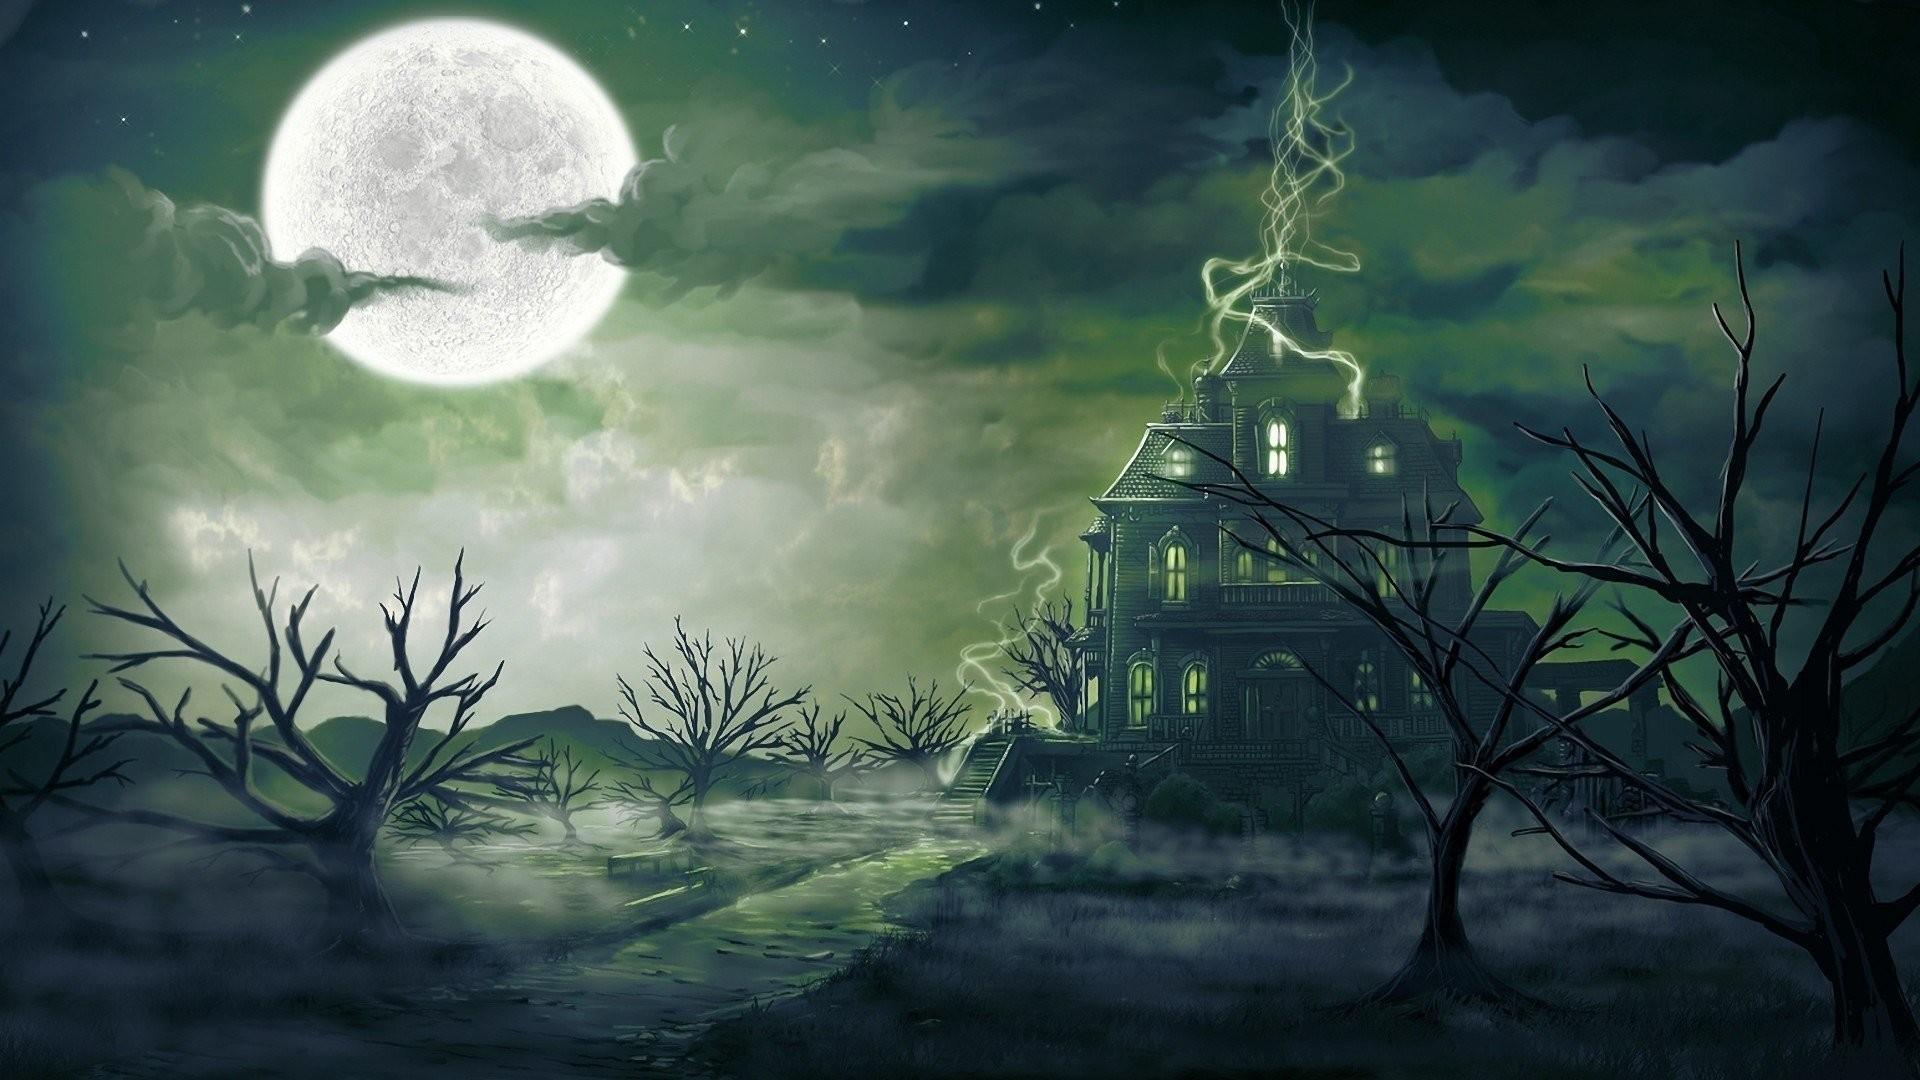 Spooky Vector Wallpaper image hd